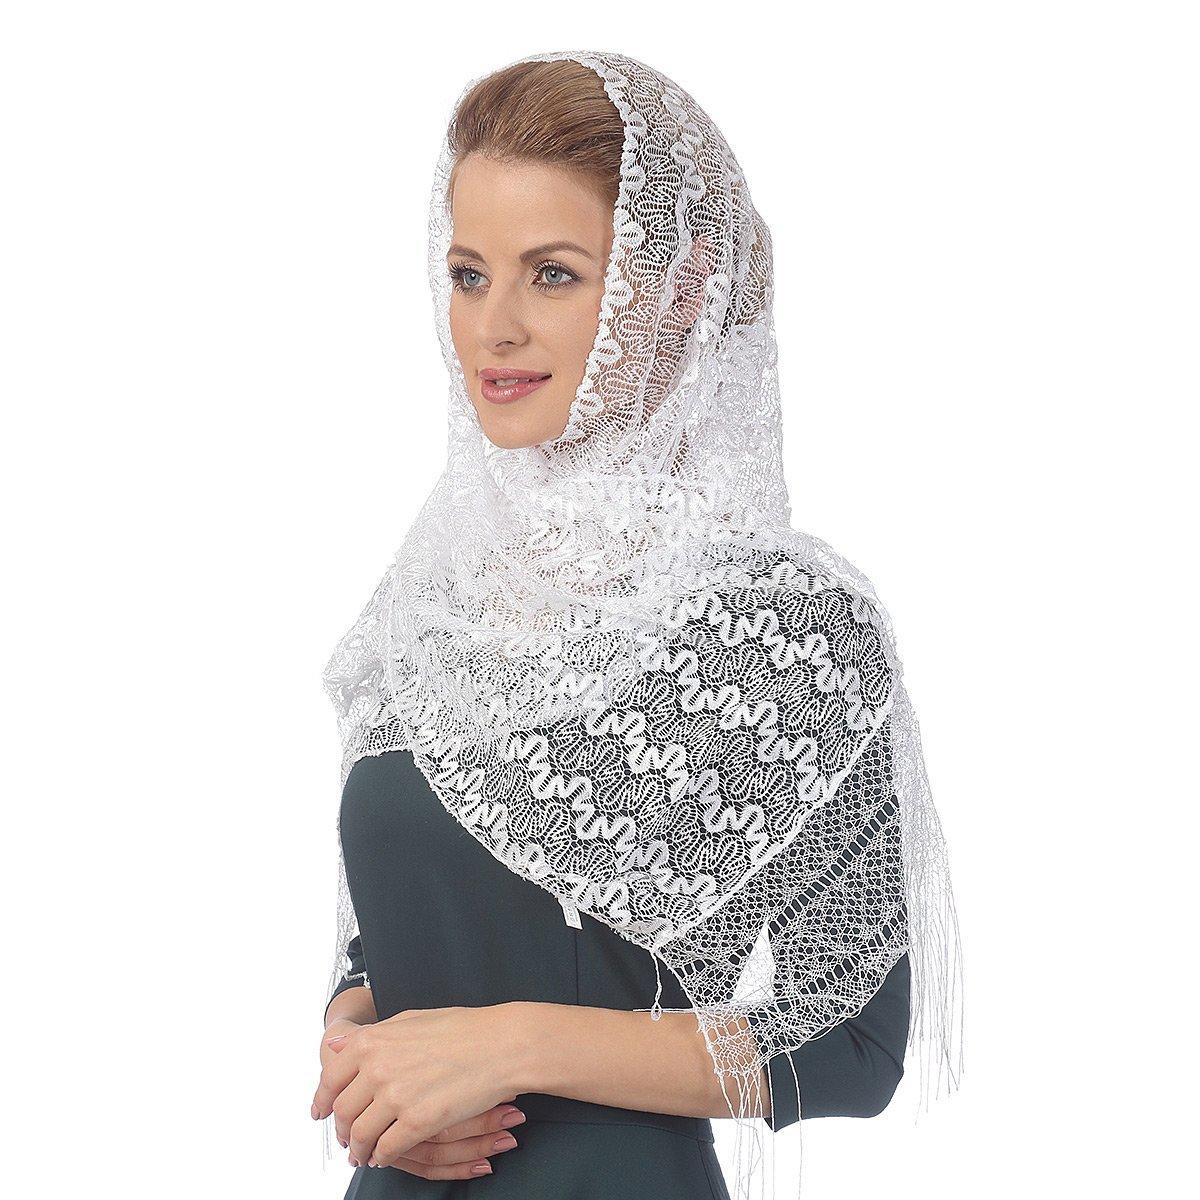 Белый платок - платок цвета радости!